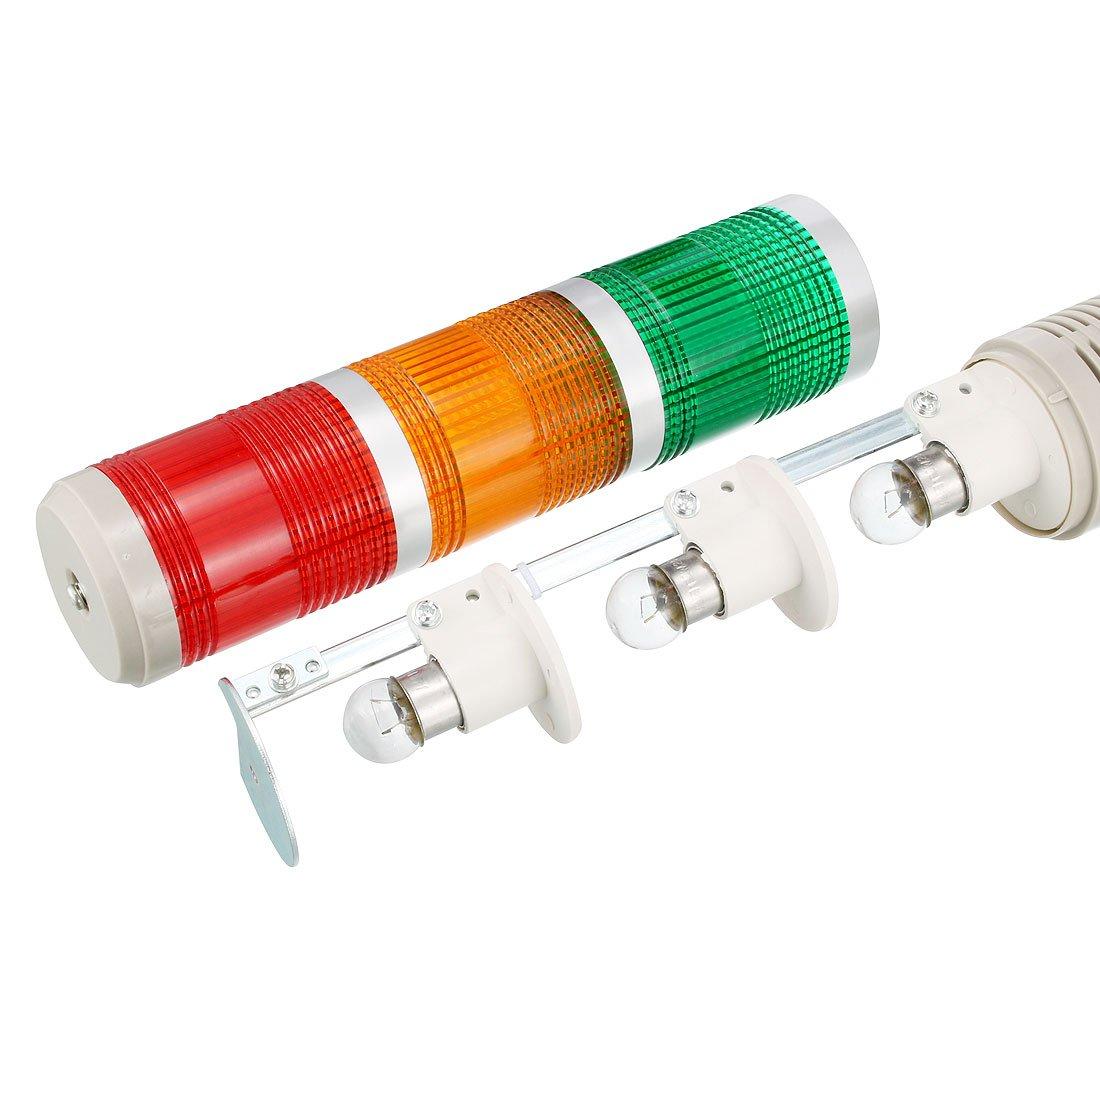 Uxcell Warning Light Bulb Flashing Bright Industrial Signal Alarm 24vdc Buzzer Wiring Diagram Tower Lamp 90dbdc24v Red Green Yellow Tb50 3w E J